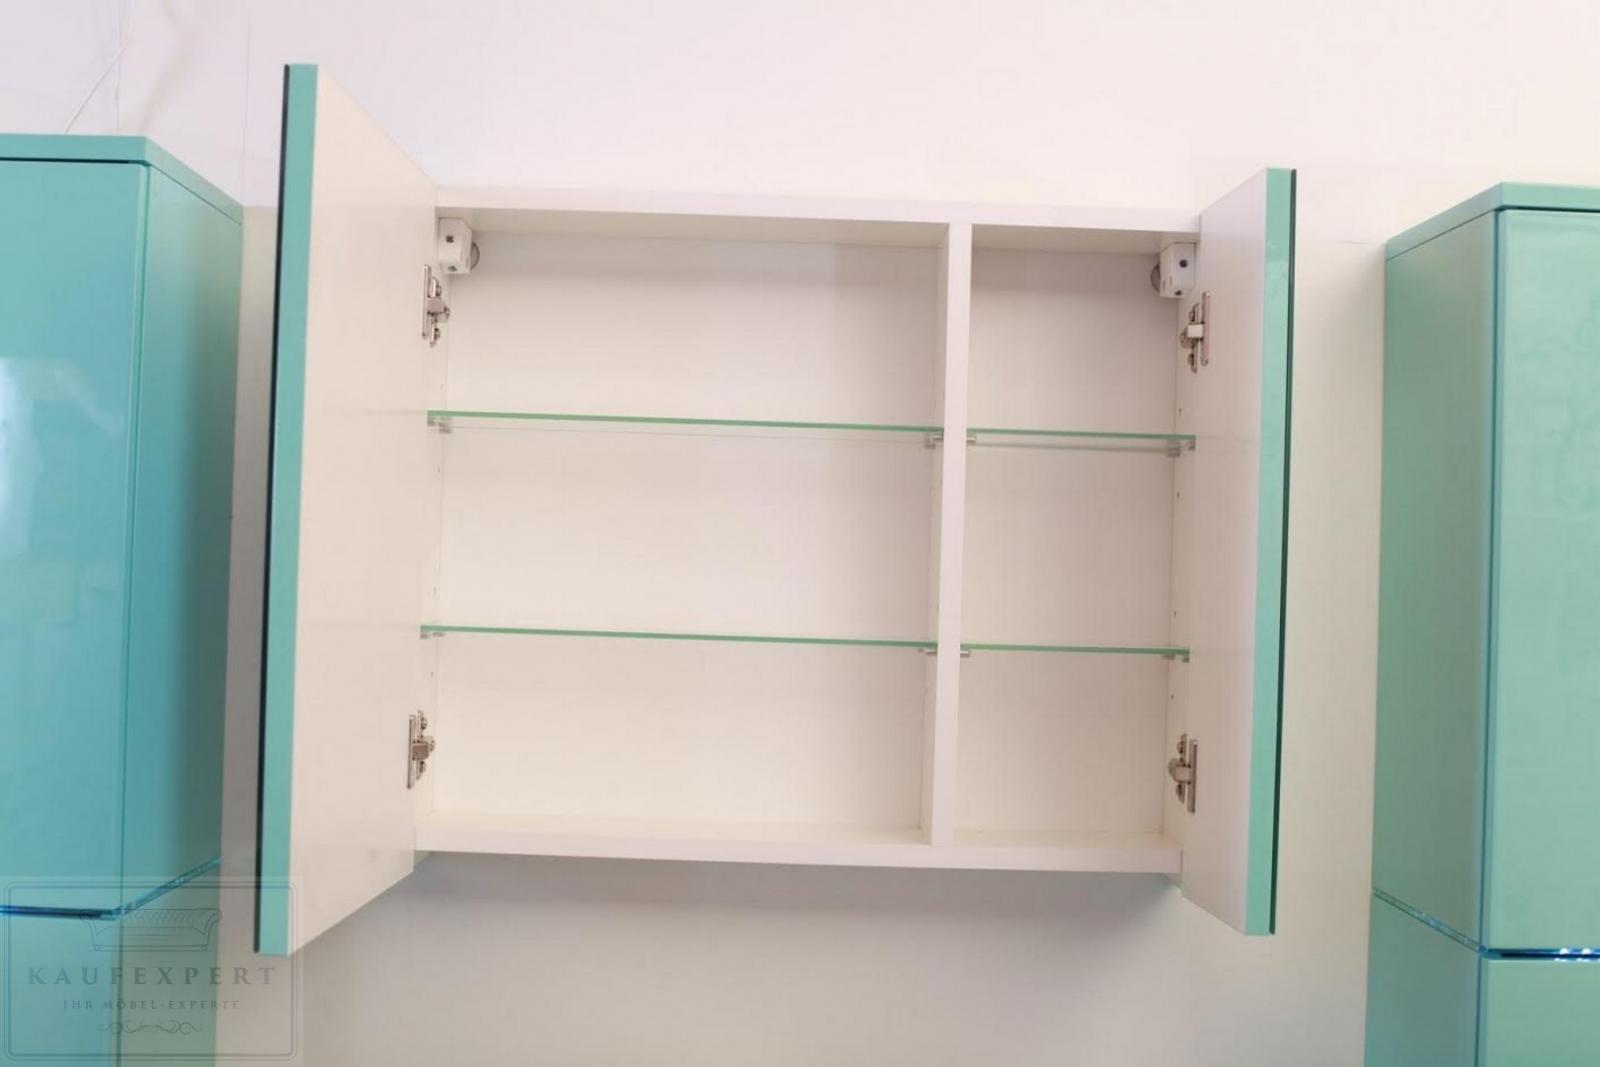 kaufexpert - badmöbel-set prestige 1 lichtgrün hochglanz lackiert, Badezimmer ideen